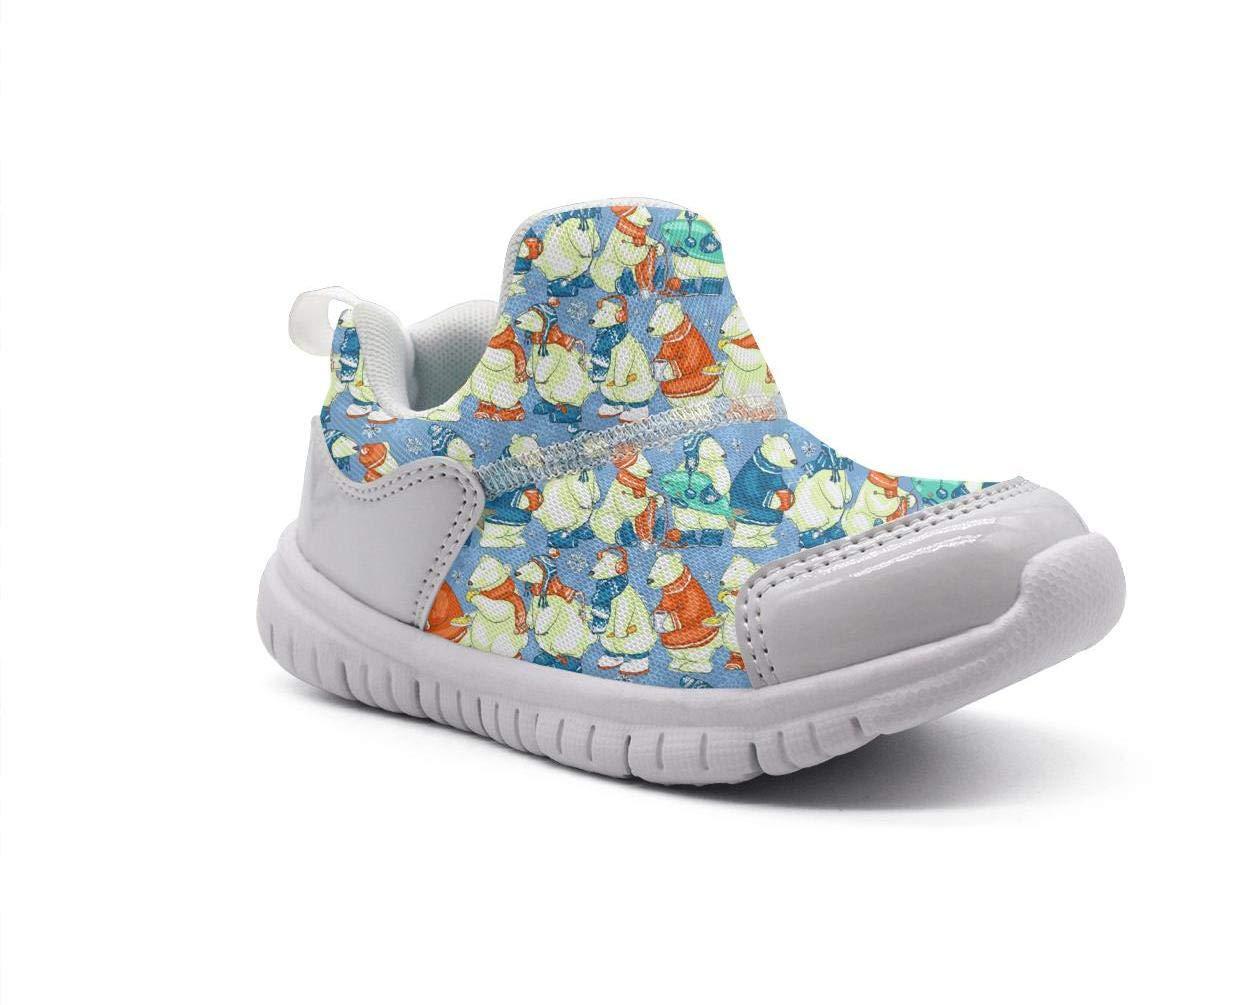 ONEYUAN Children The Polar Bear Habitat Blue Kid Casual Lightweight Sport Shoes Sneakers Running Shoes